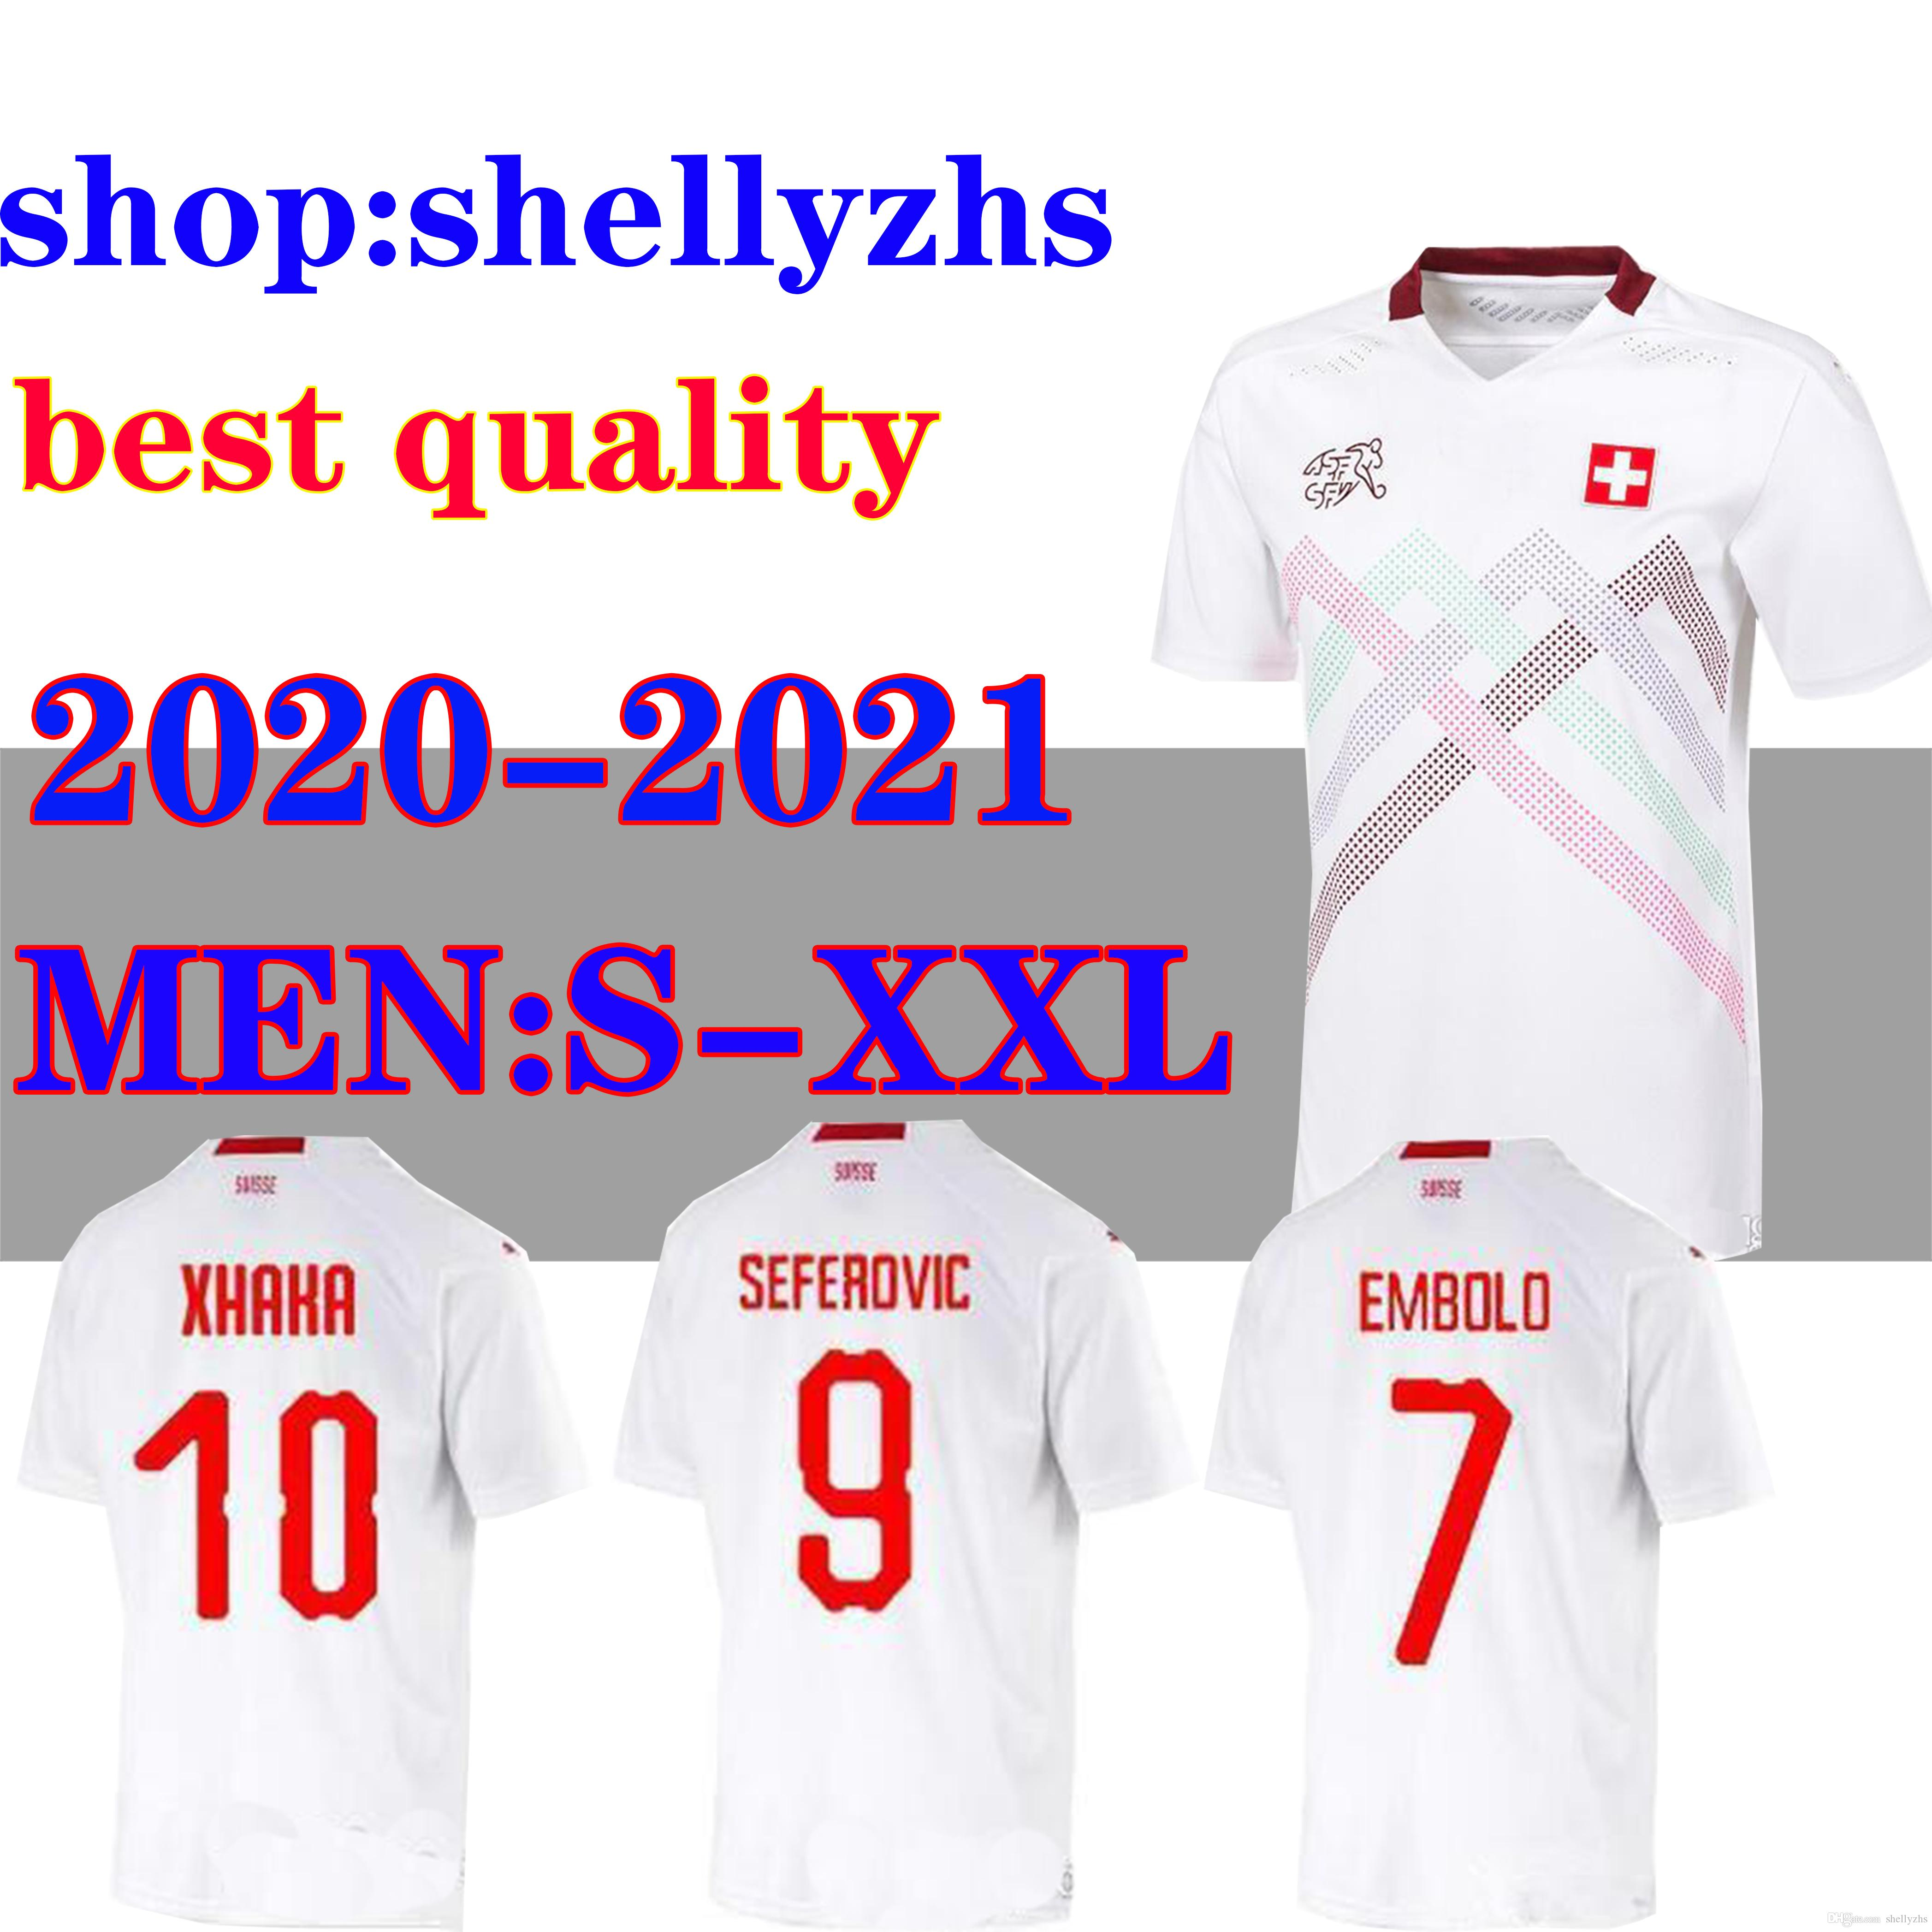 Suisse 2020 2021 Suiza Jerseys de fútbol lejos 20 21 Suiza Akanji Zakaria Rodriguez Elvedi National Team Football Shirts